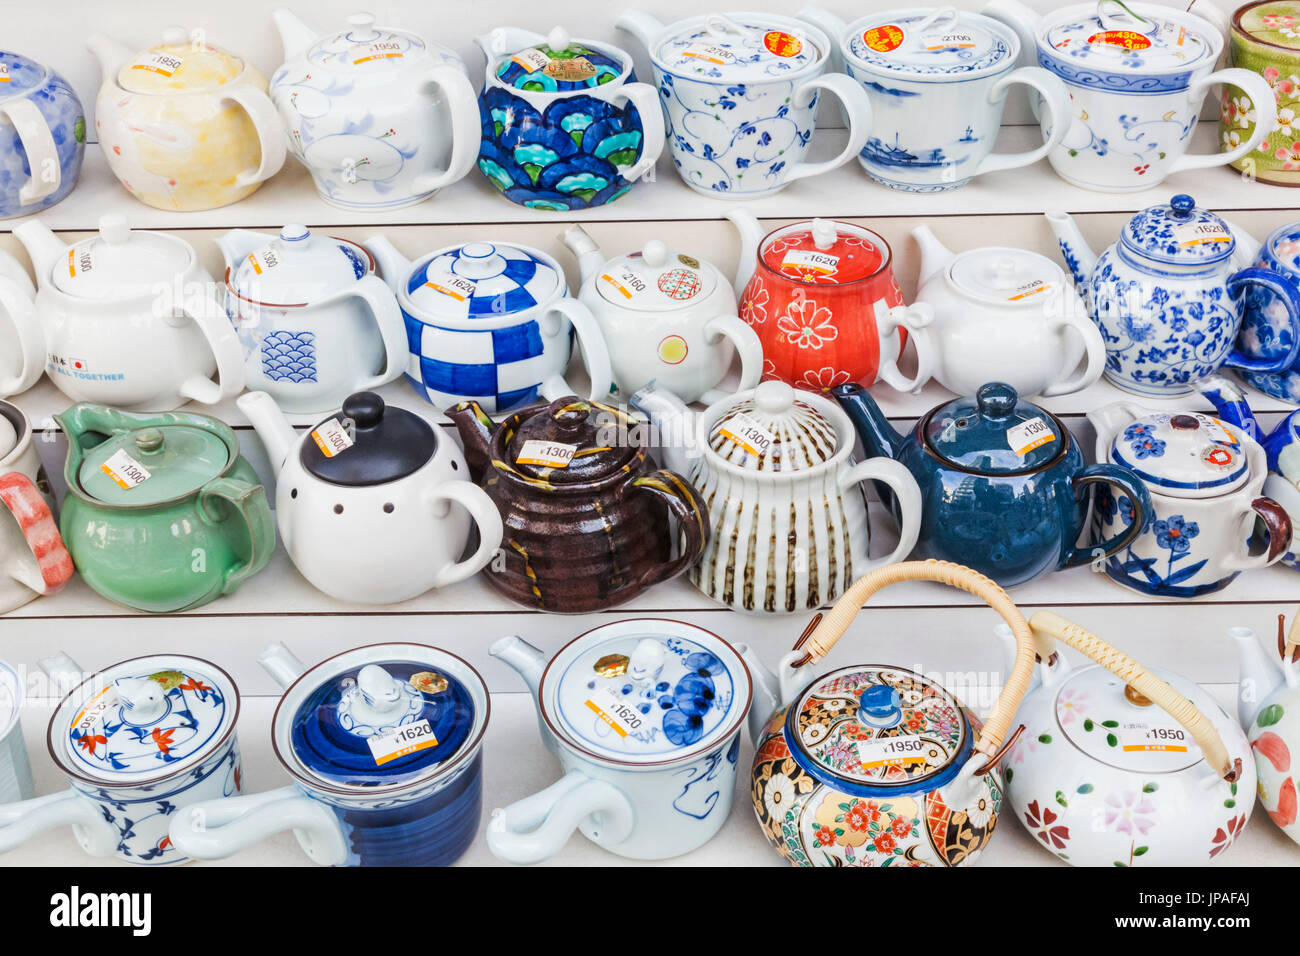 Japan, Honshu, Tokyo, Asakusa, Shop Display of Teapots - Stock Image